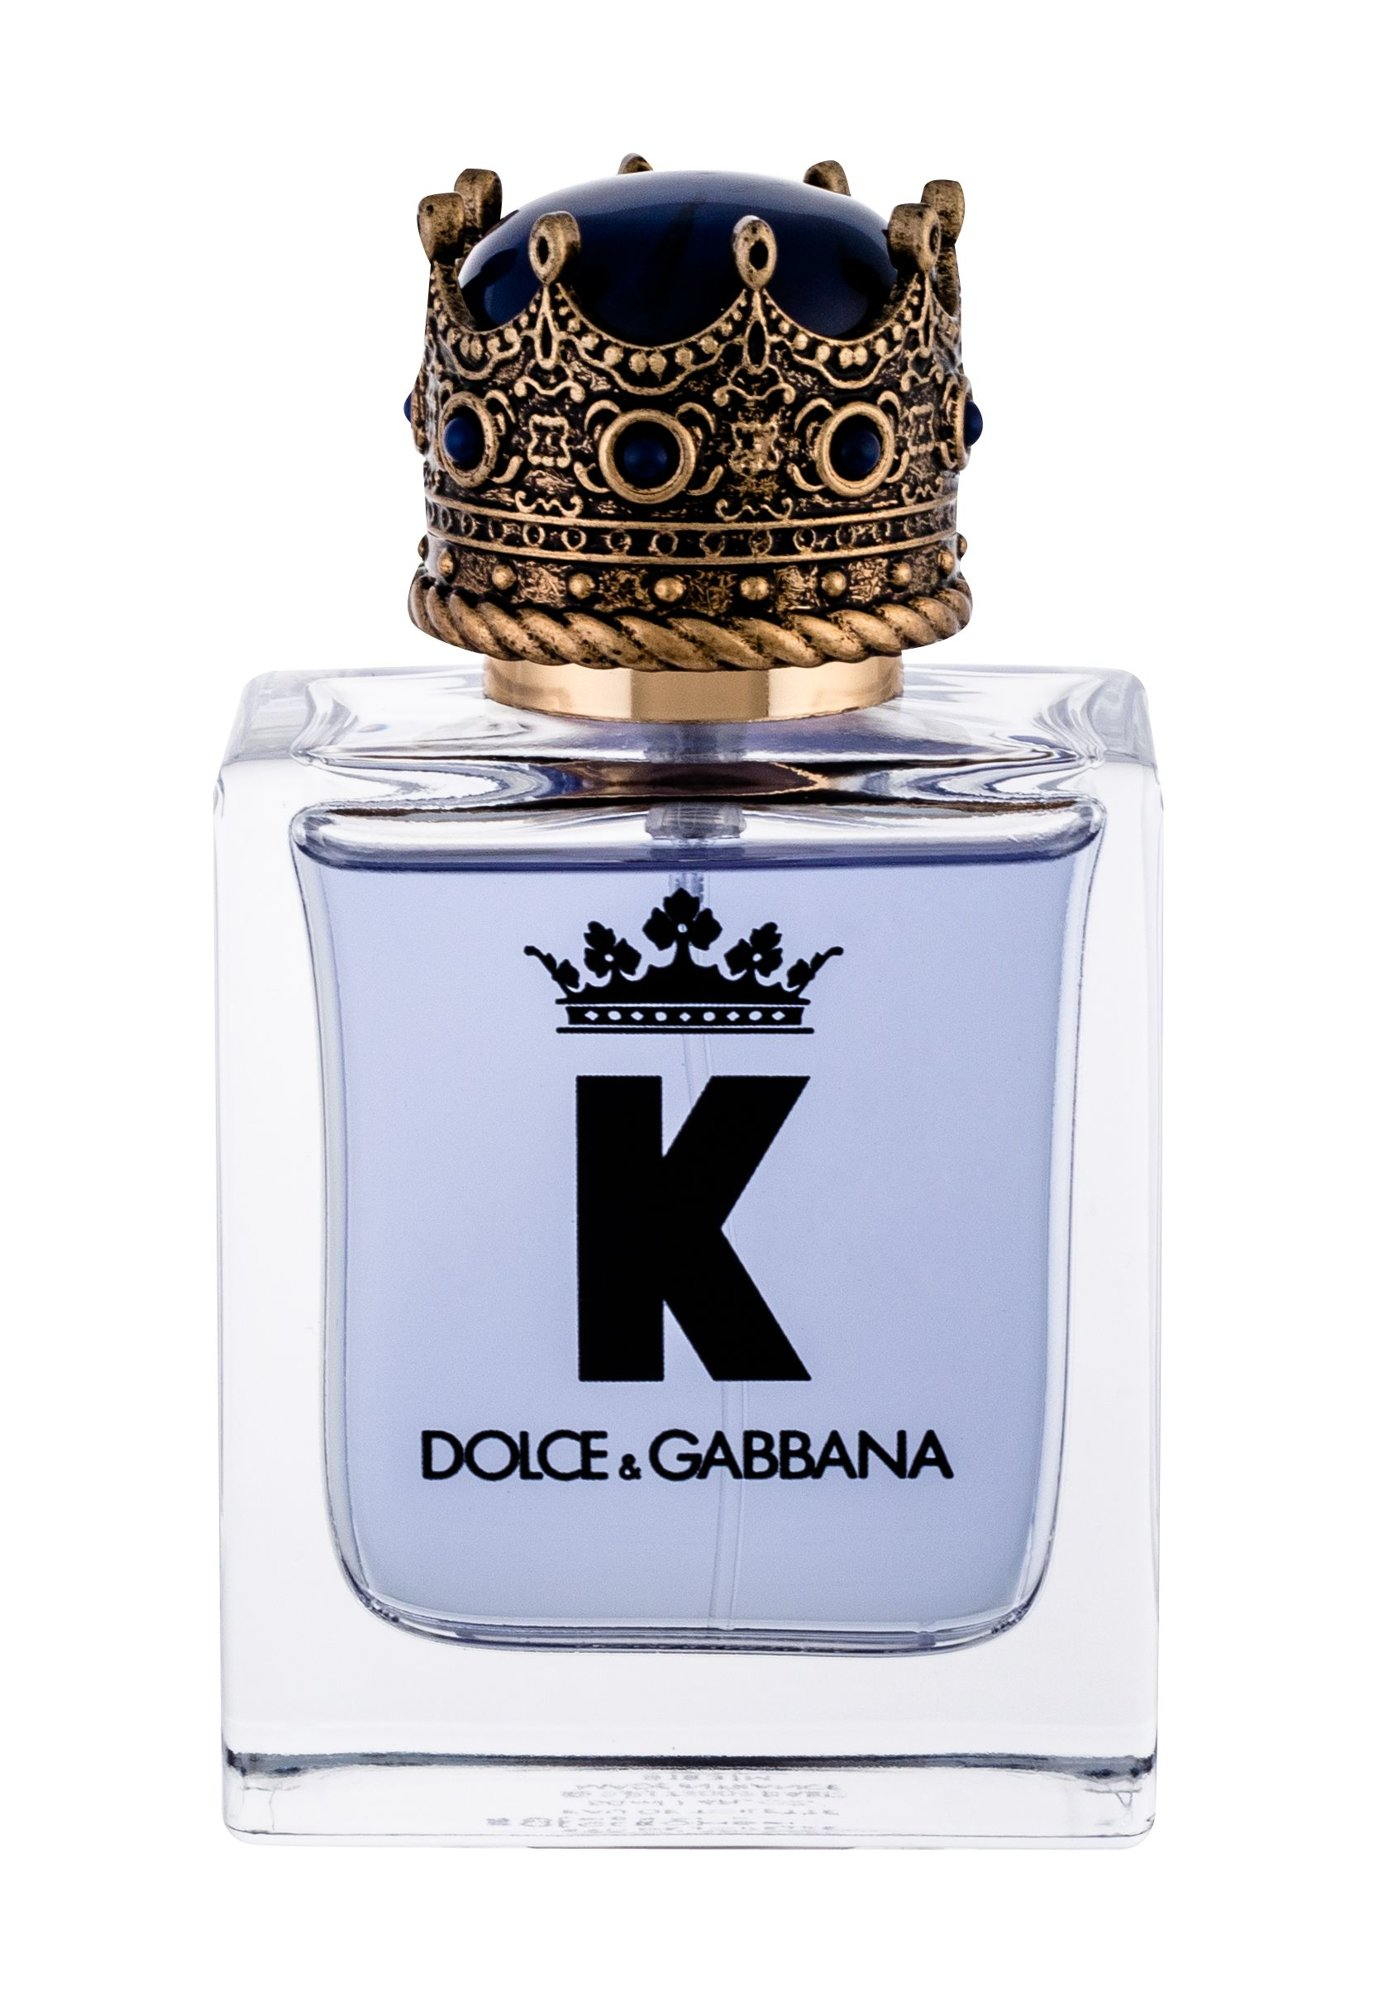 Dolce&Gabbana K Eau de Toilette 50ml